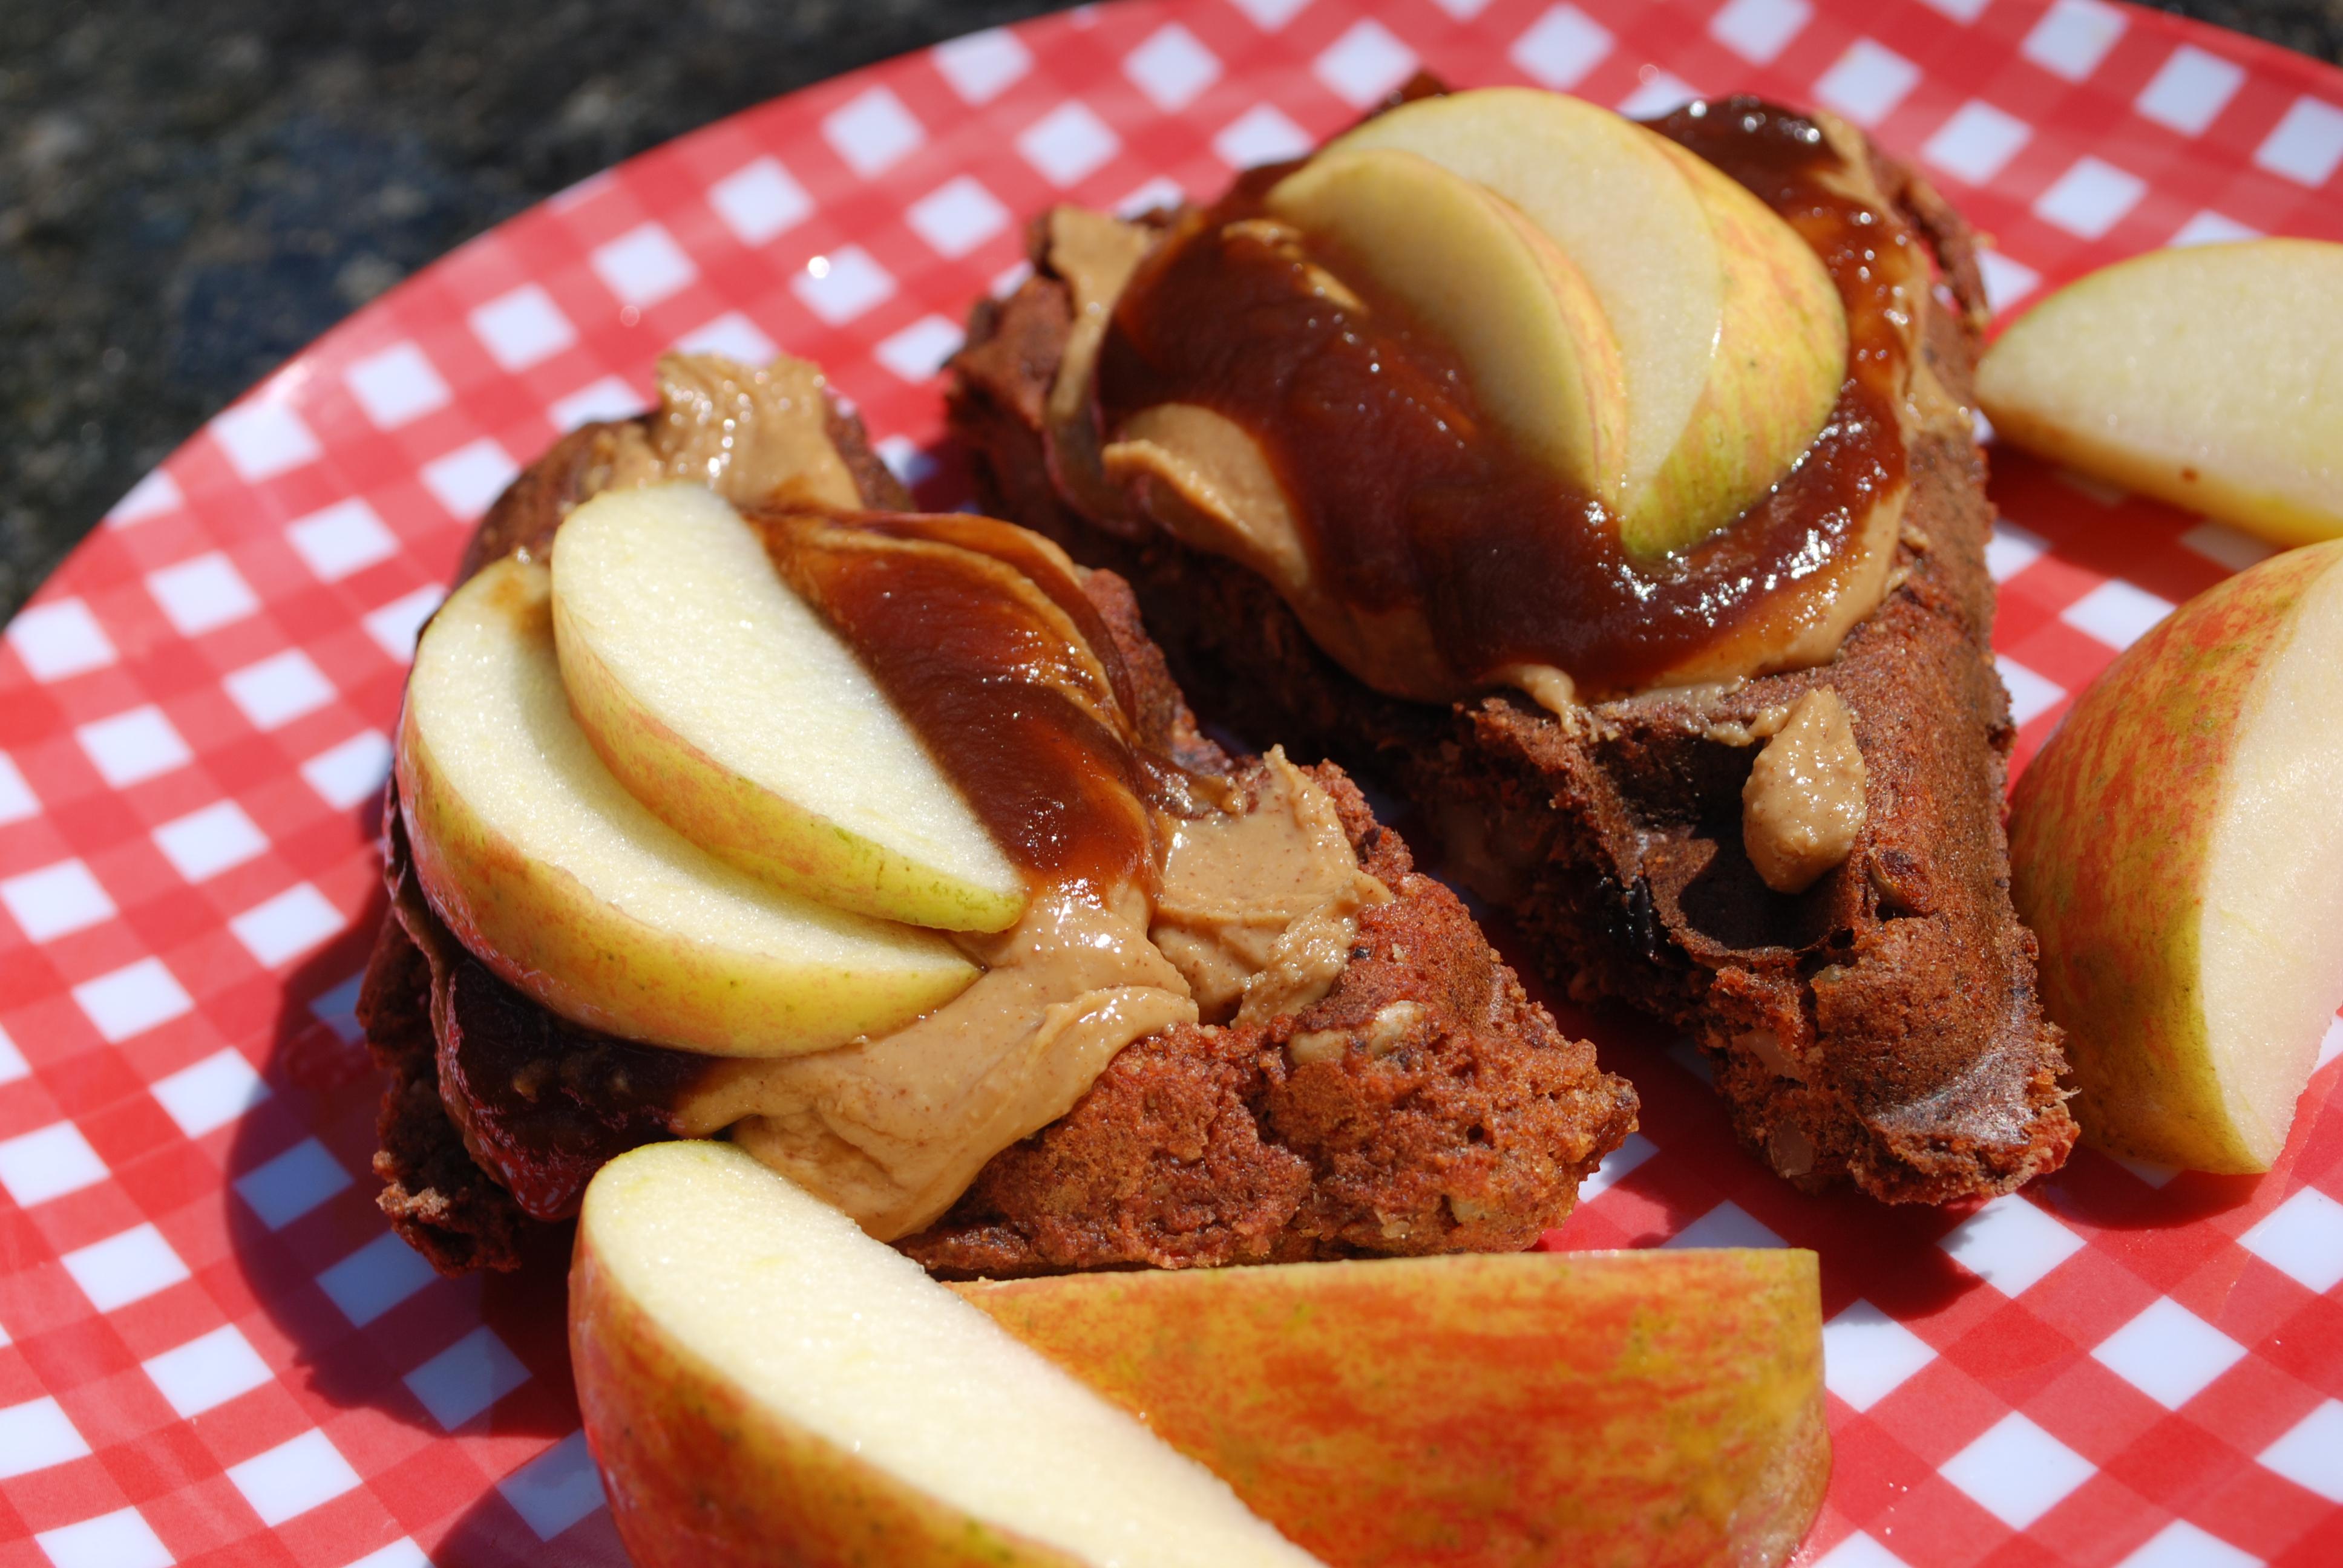 Peanut butter and apple butter waffles